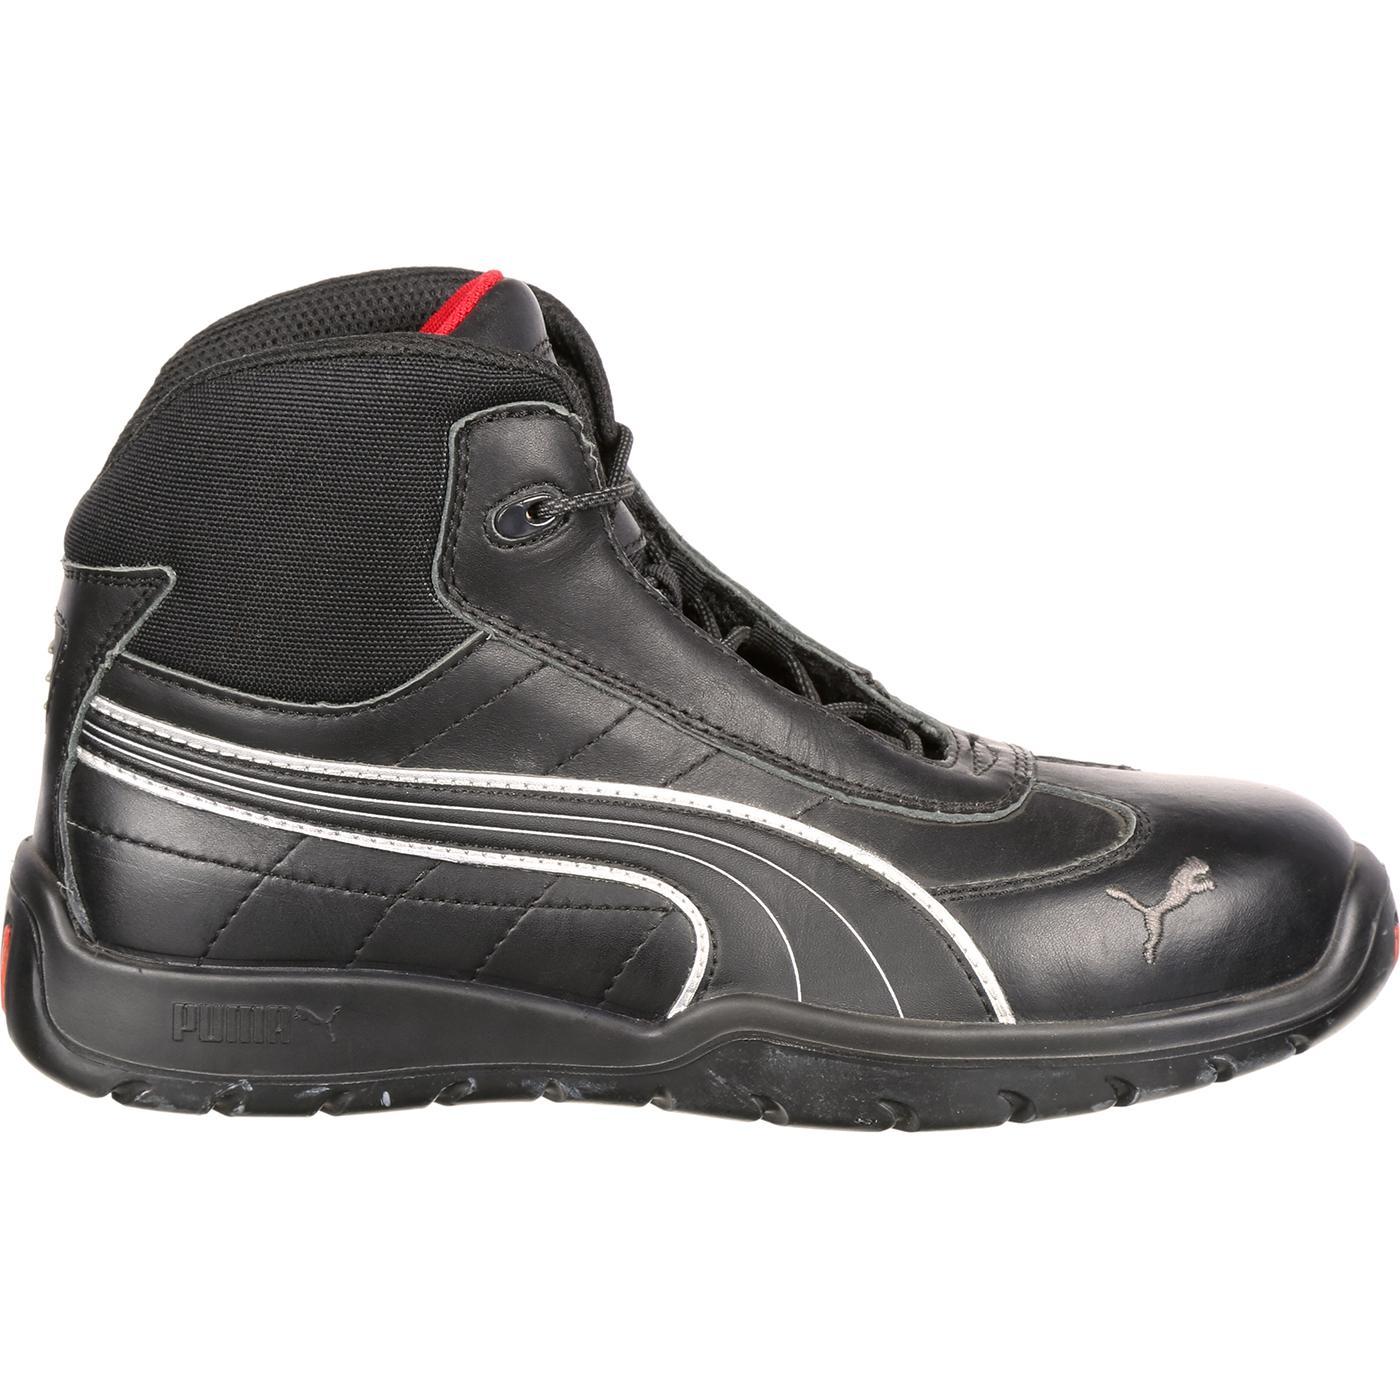 530bfcec6063 ... Daytona Mid Steel Toe Static-Dissipative Work Athletic Shoe